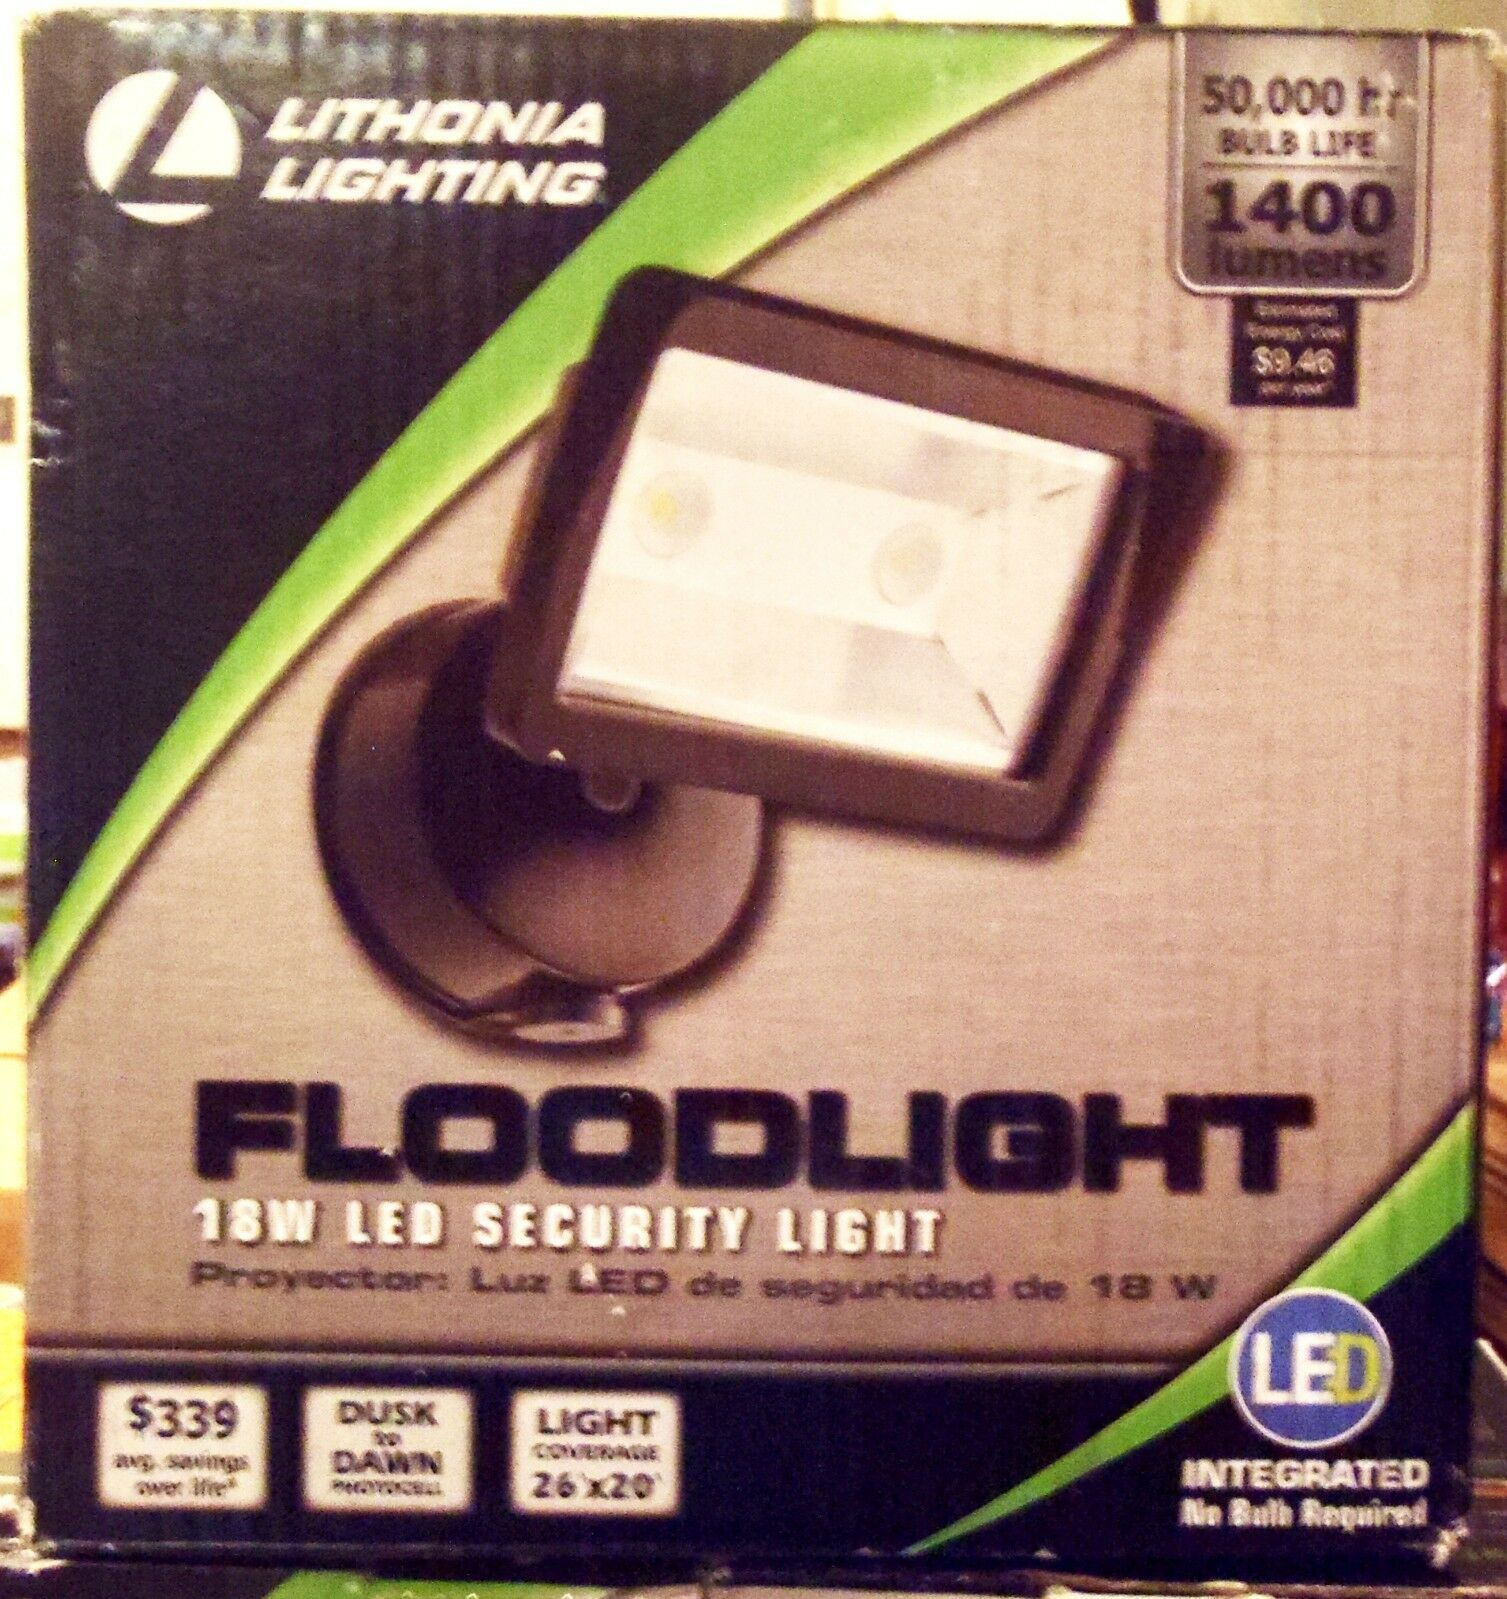 Lithonia OLFL 14 PE BZ M4 Security LED Dusk-to-Dawn Floodlight Bronze